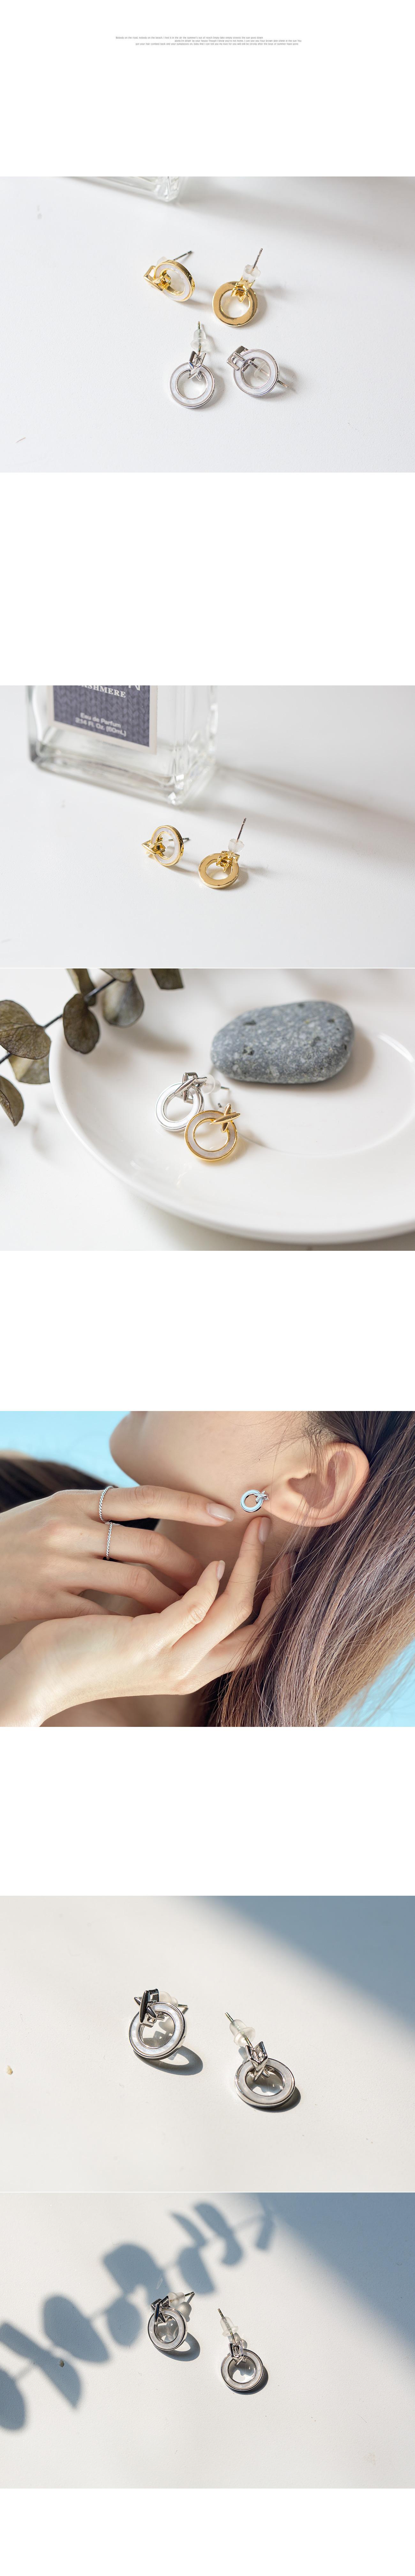 Luxurious Mini Bean One Earring #86249